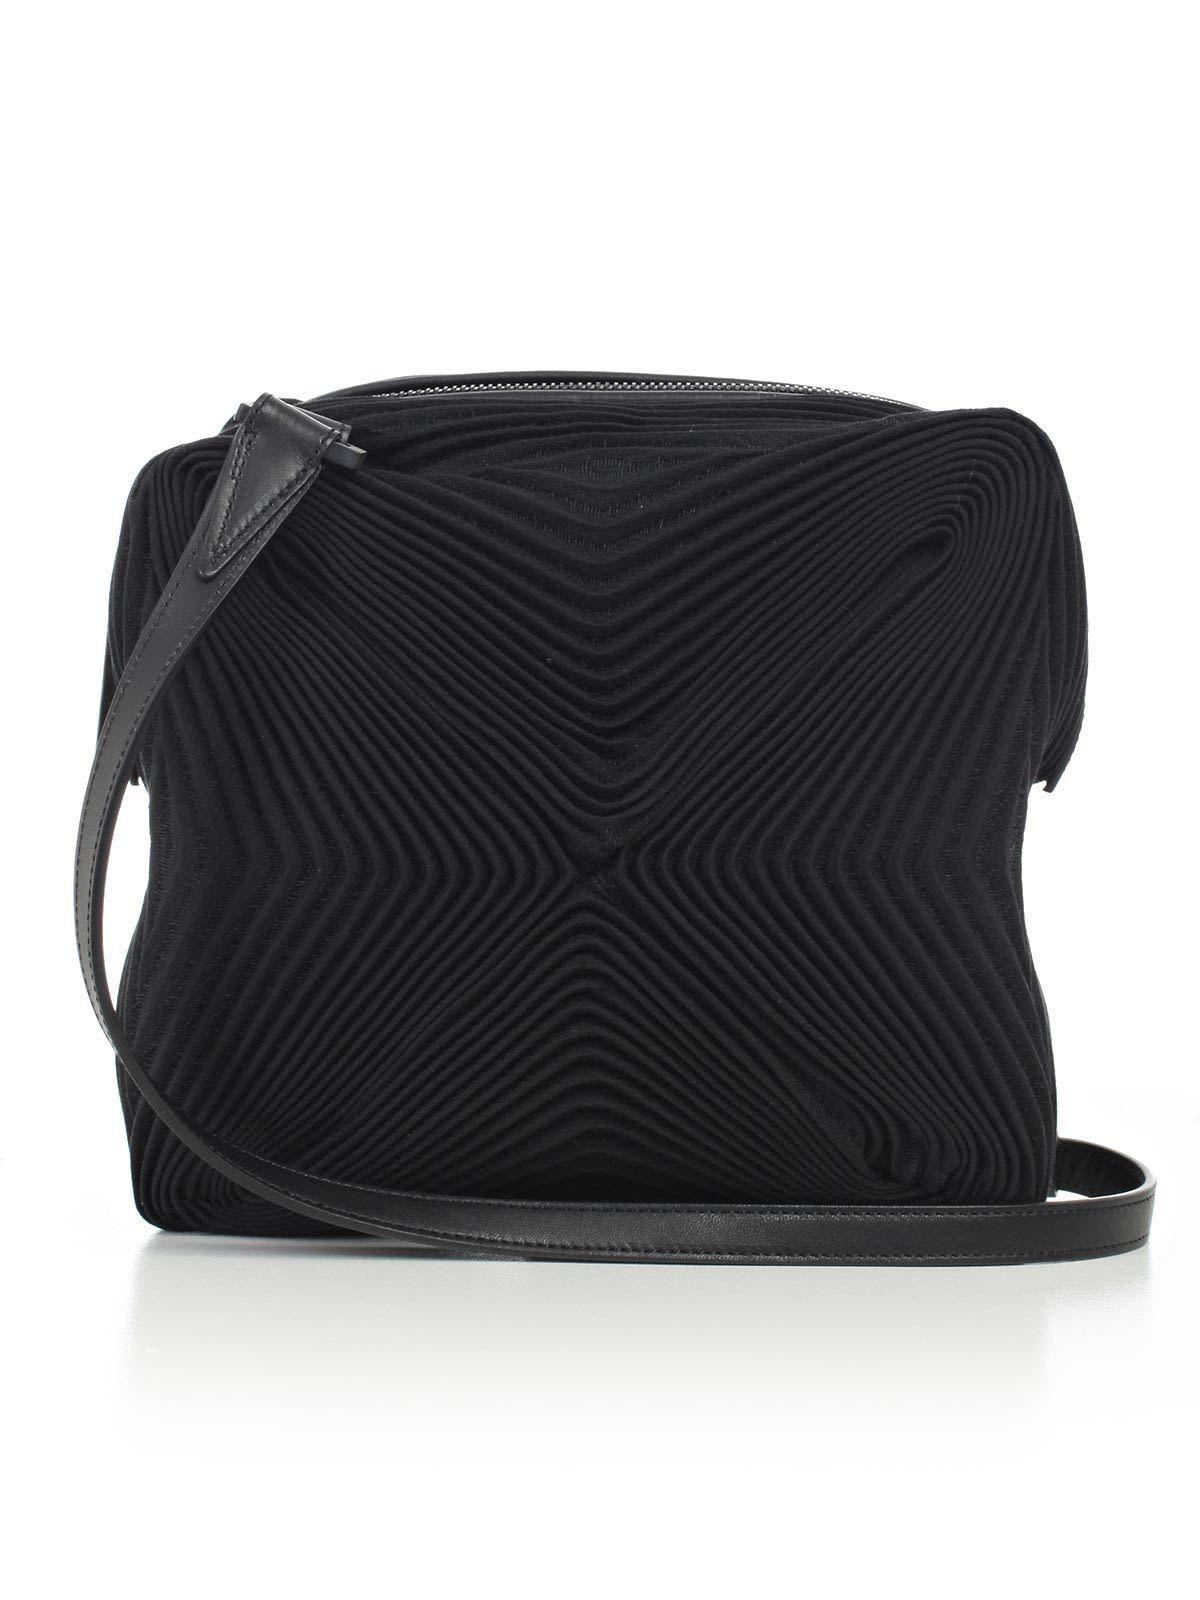 d609e38001e1 ISSEY MIYAKE SHOULDER BAG.  isseymiyake  bags  shoulder bags  polyester   cotton